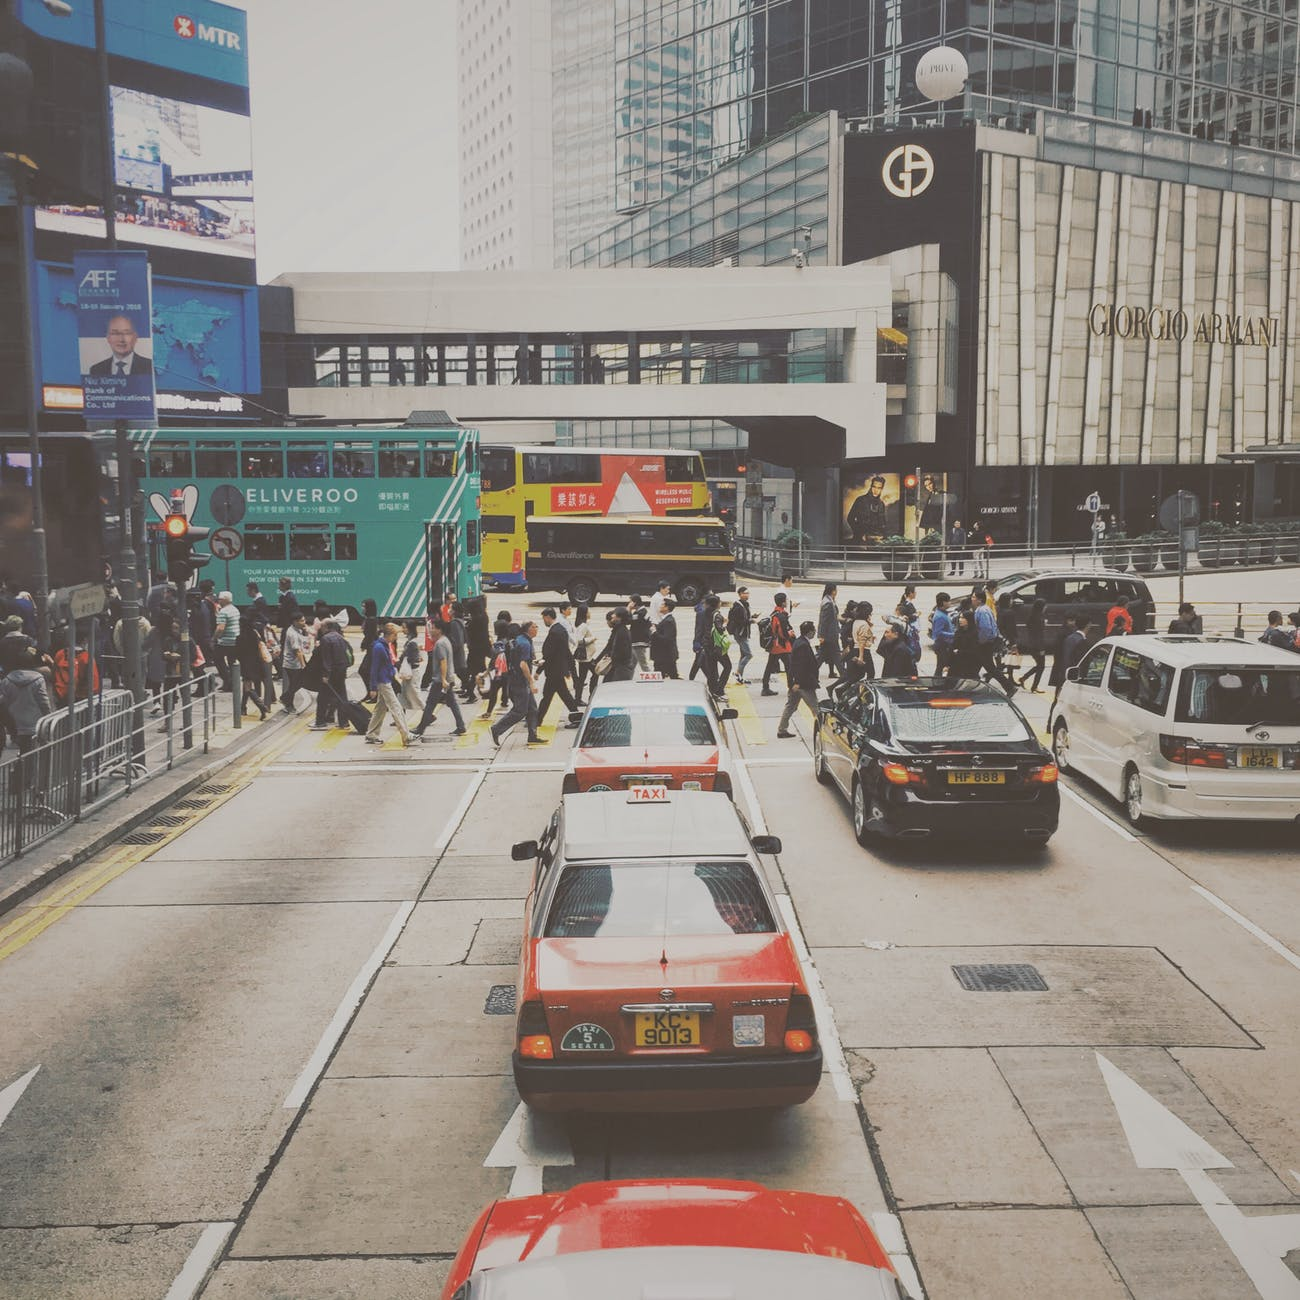 people crossing in pedestrian lane in city during daytime